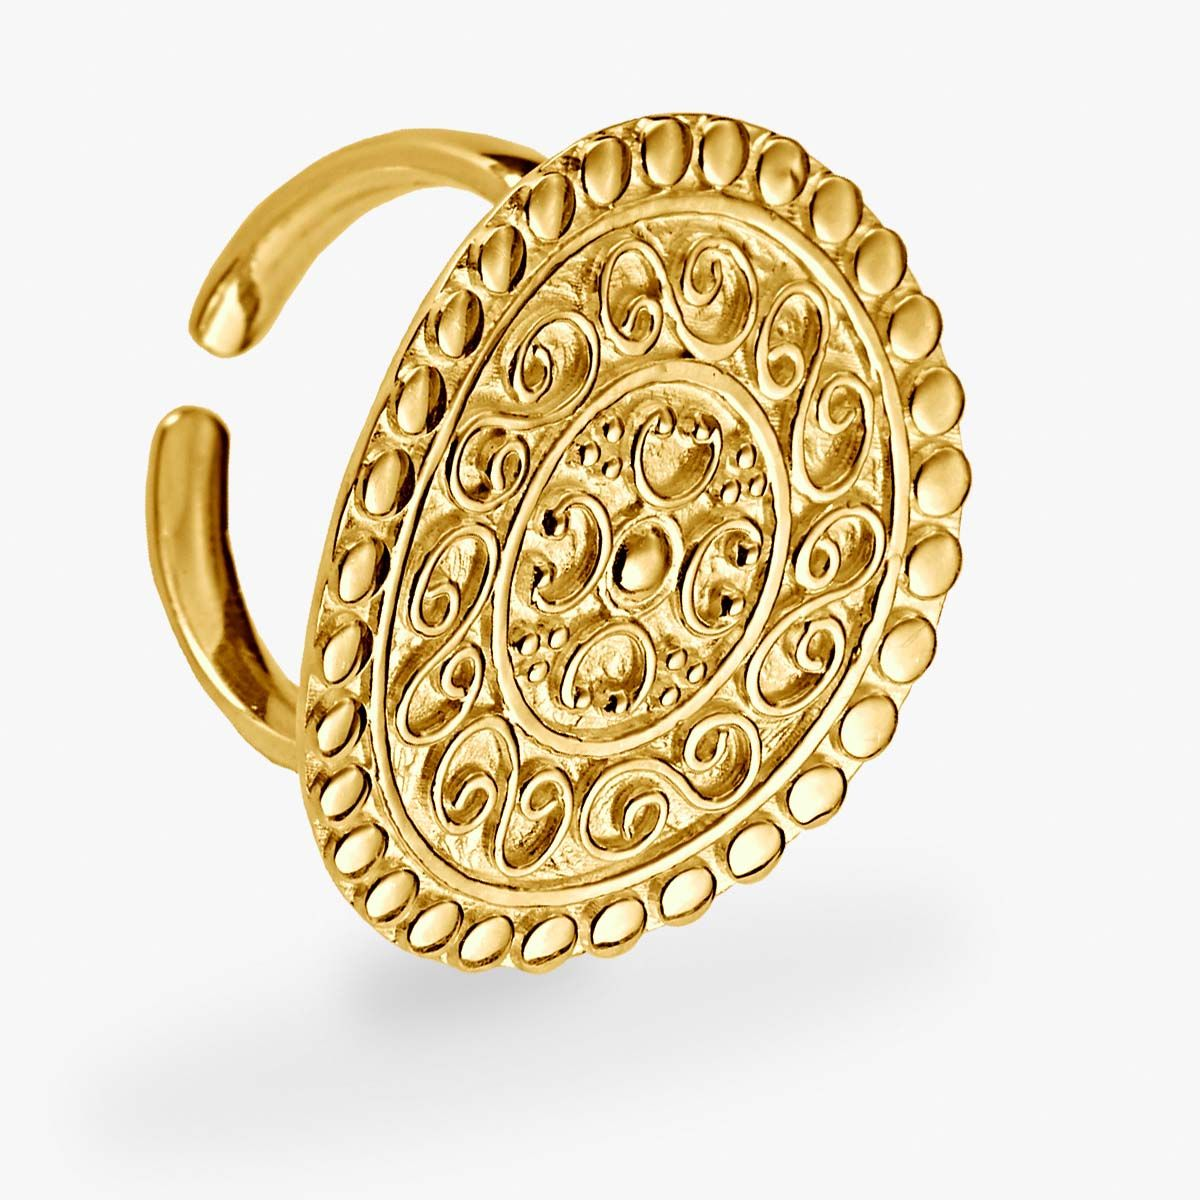 Statement ring - Ringe - Gold